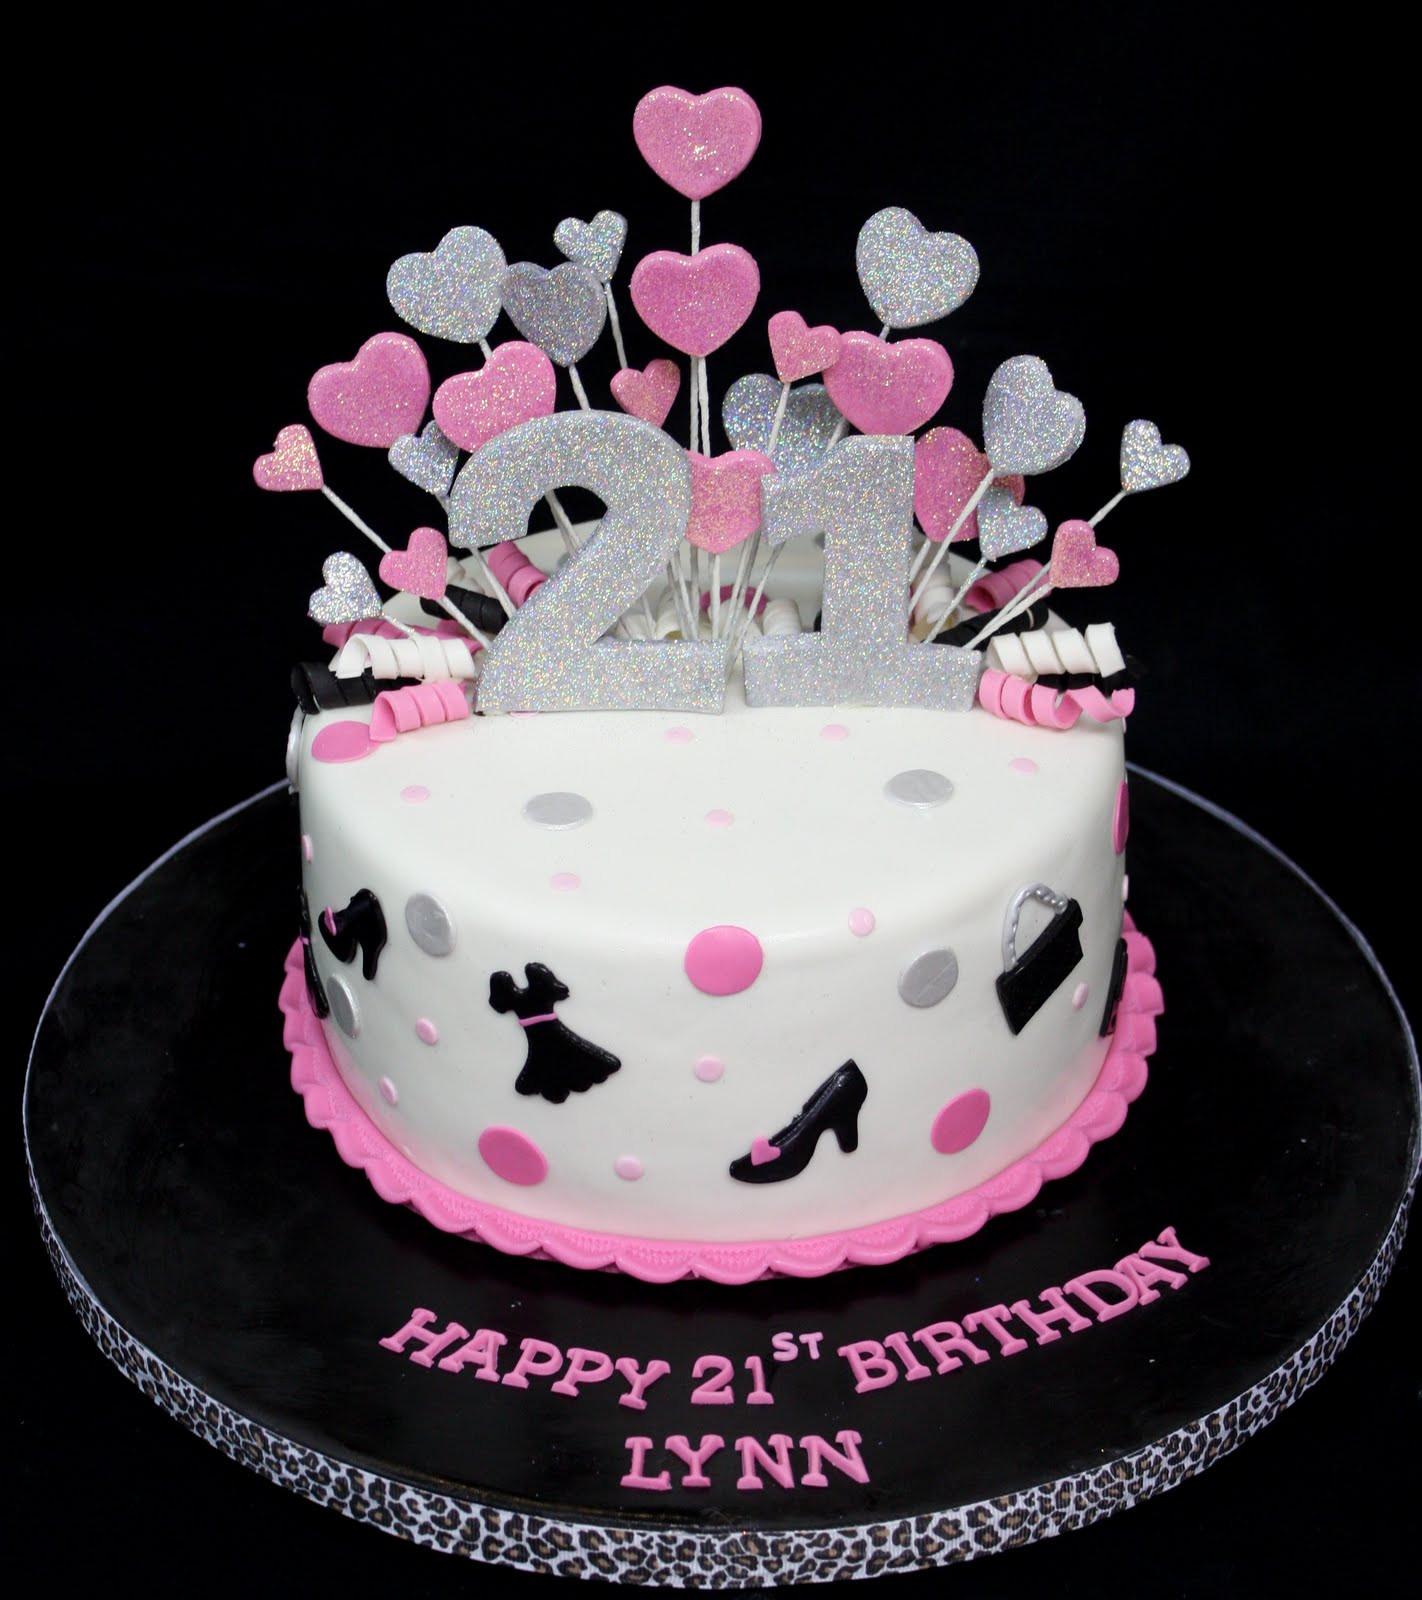 21St Birthday Cake  plete Deelite Fashion Glitter 21st Birthday Cake